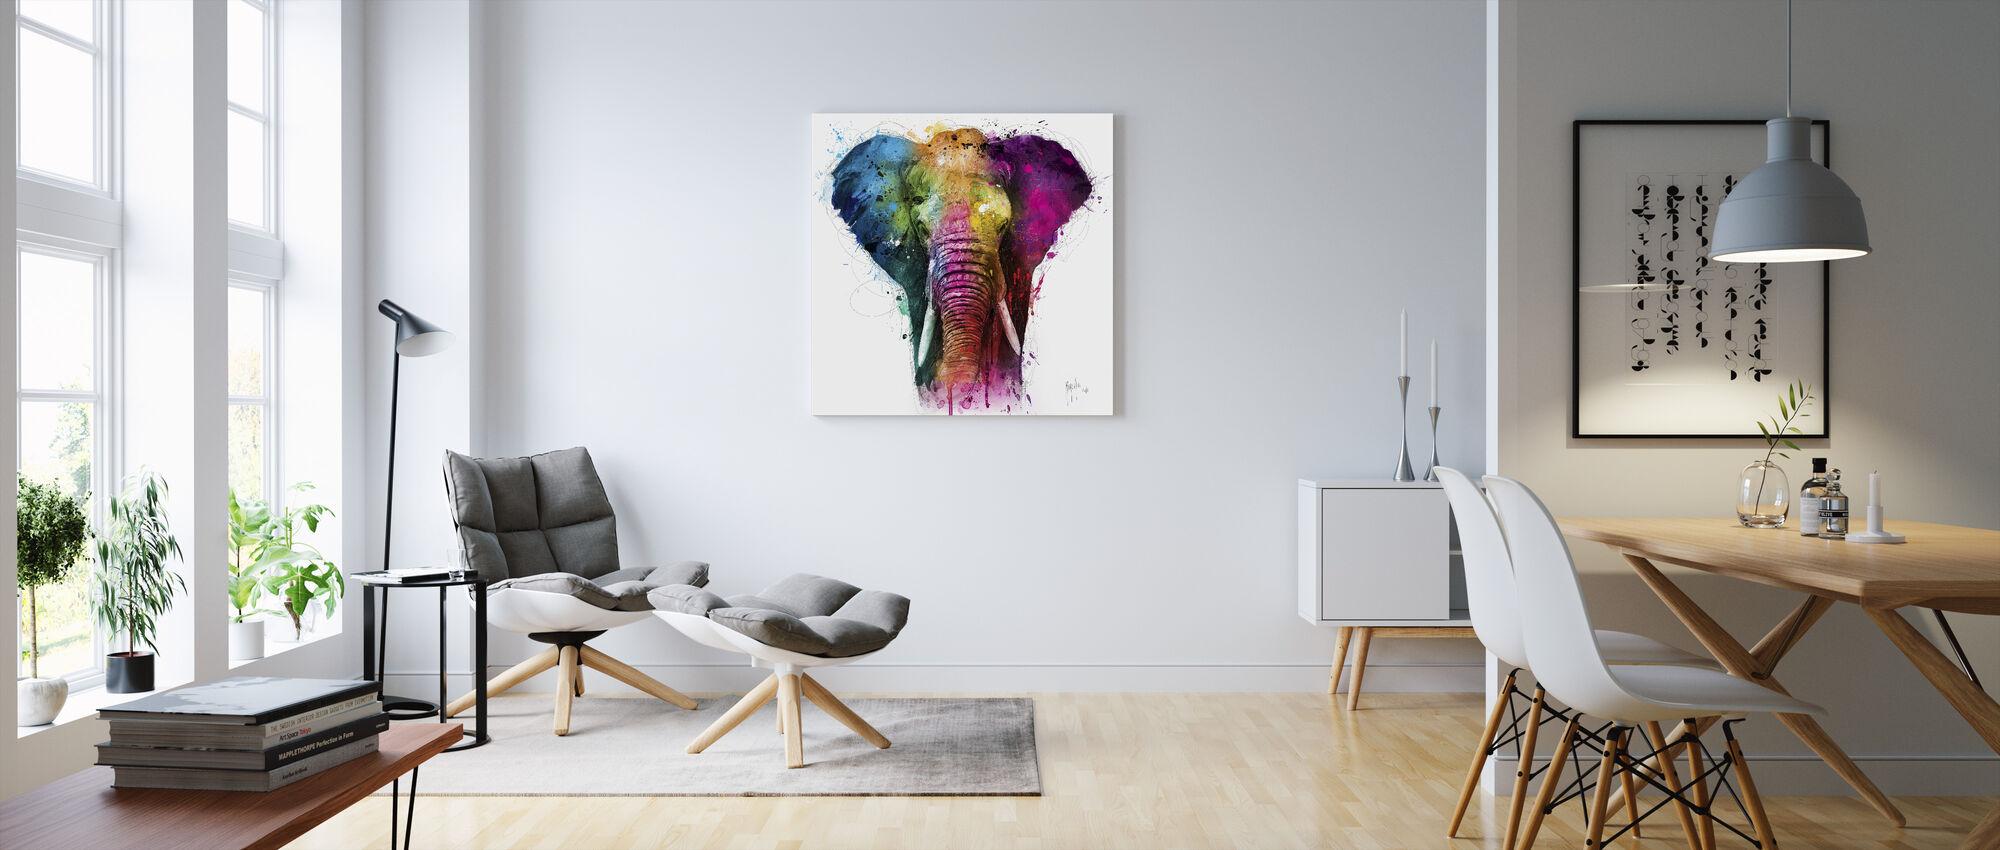 Afrika Pop - Canvastavla - Vardagsrum